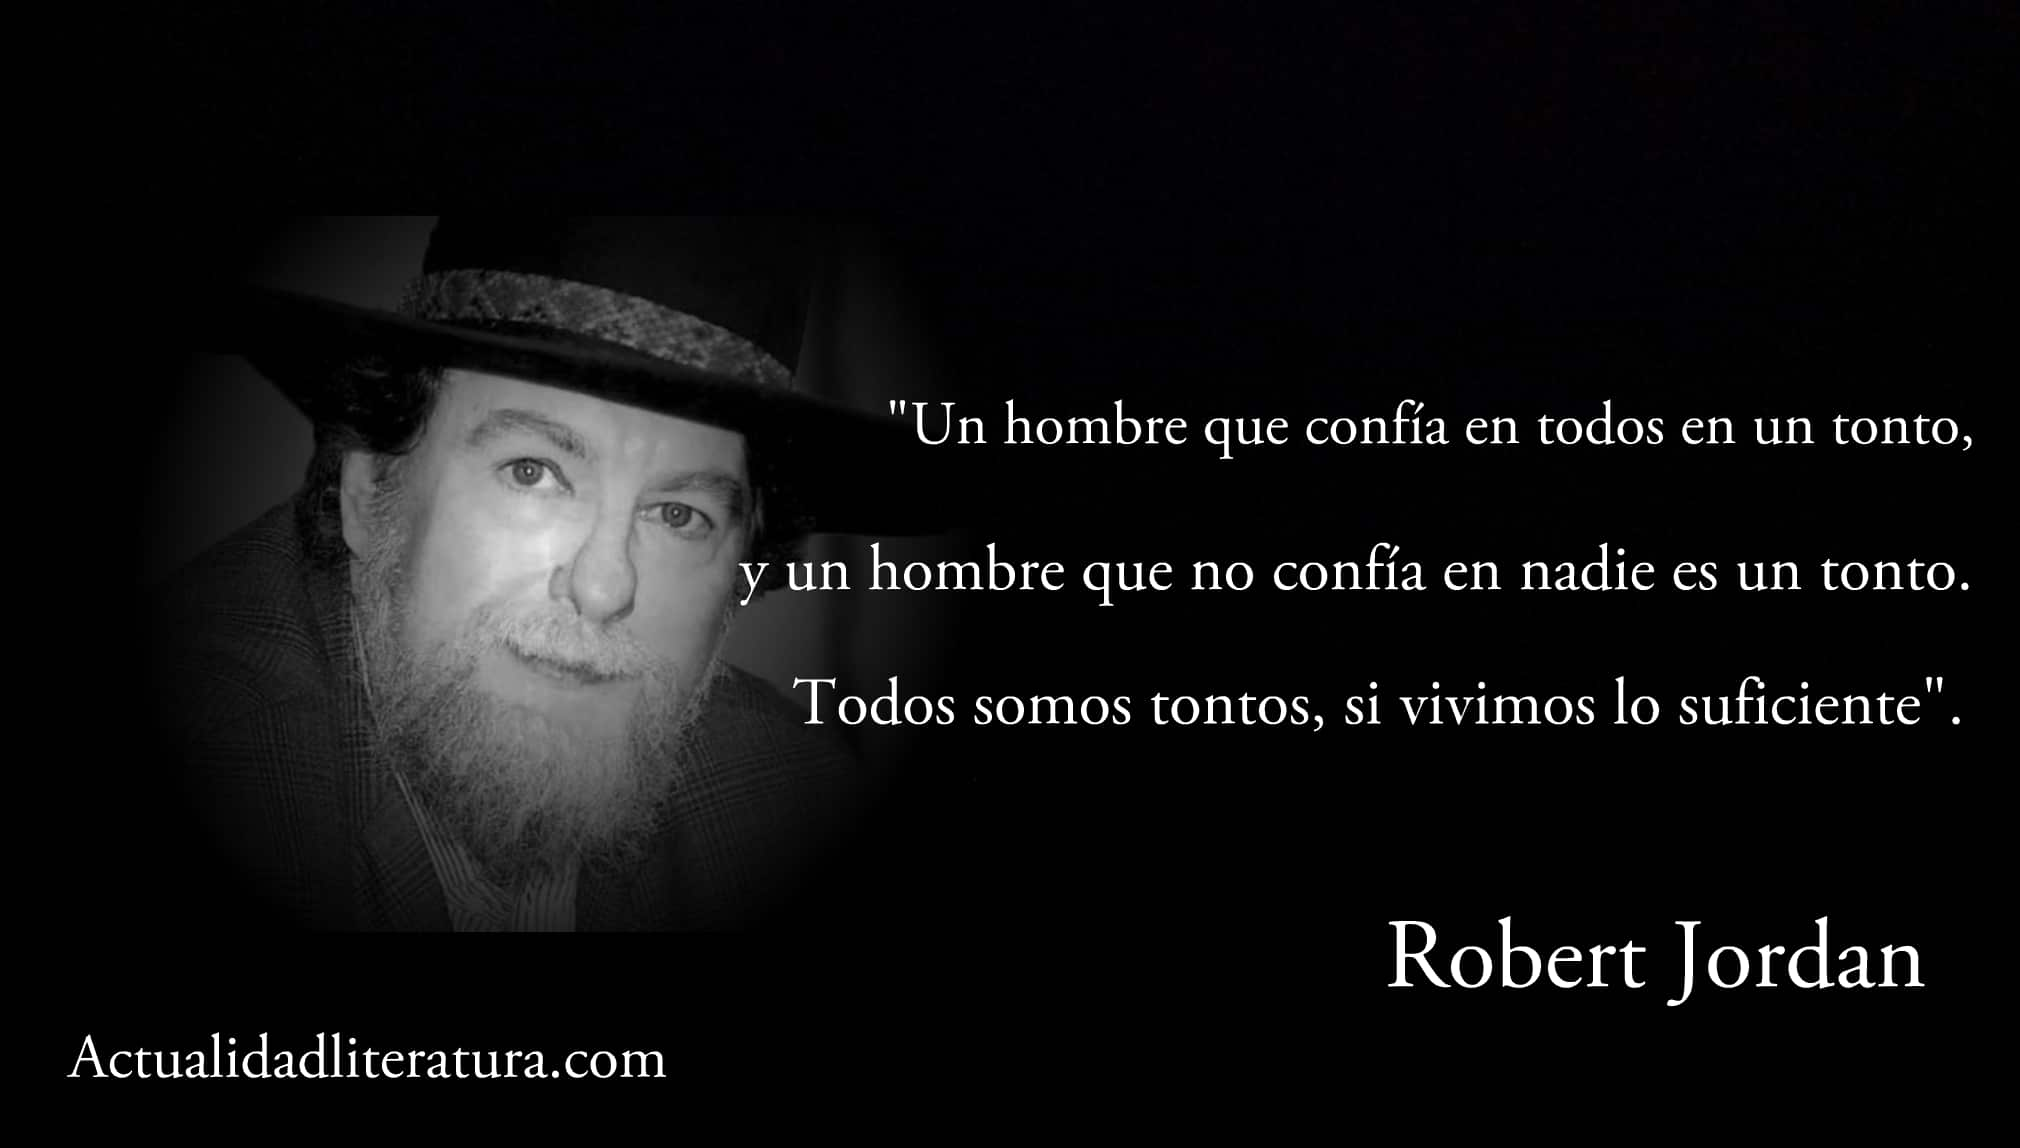 Frase de Robert Jordan.